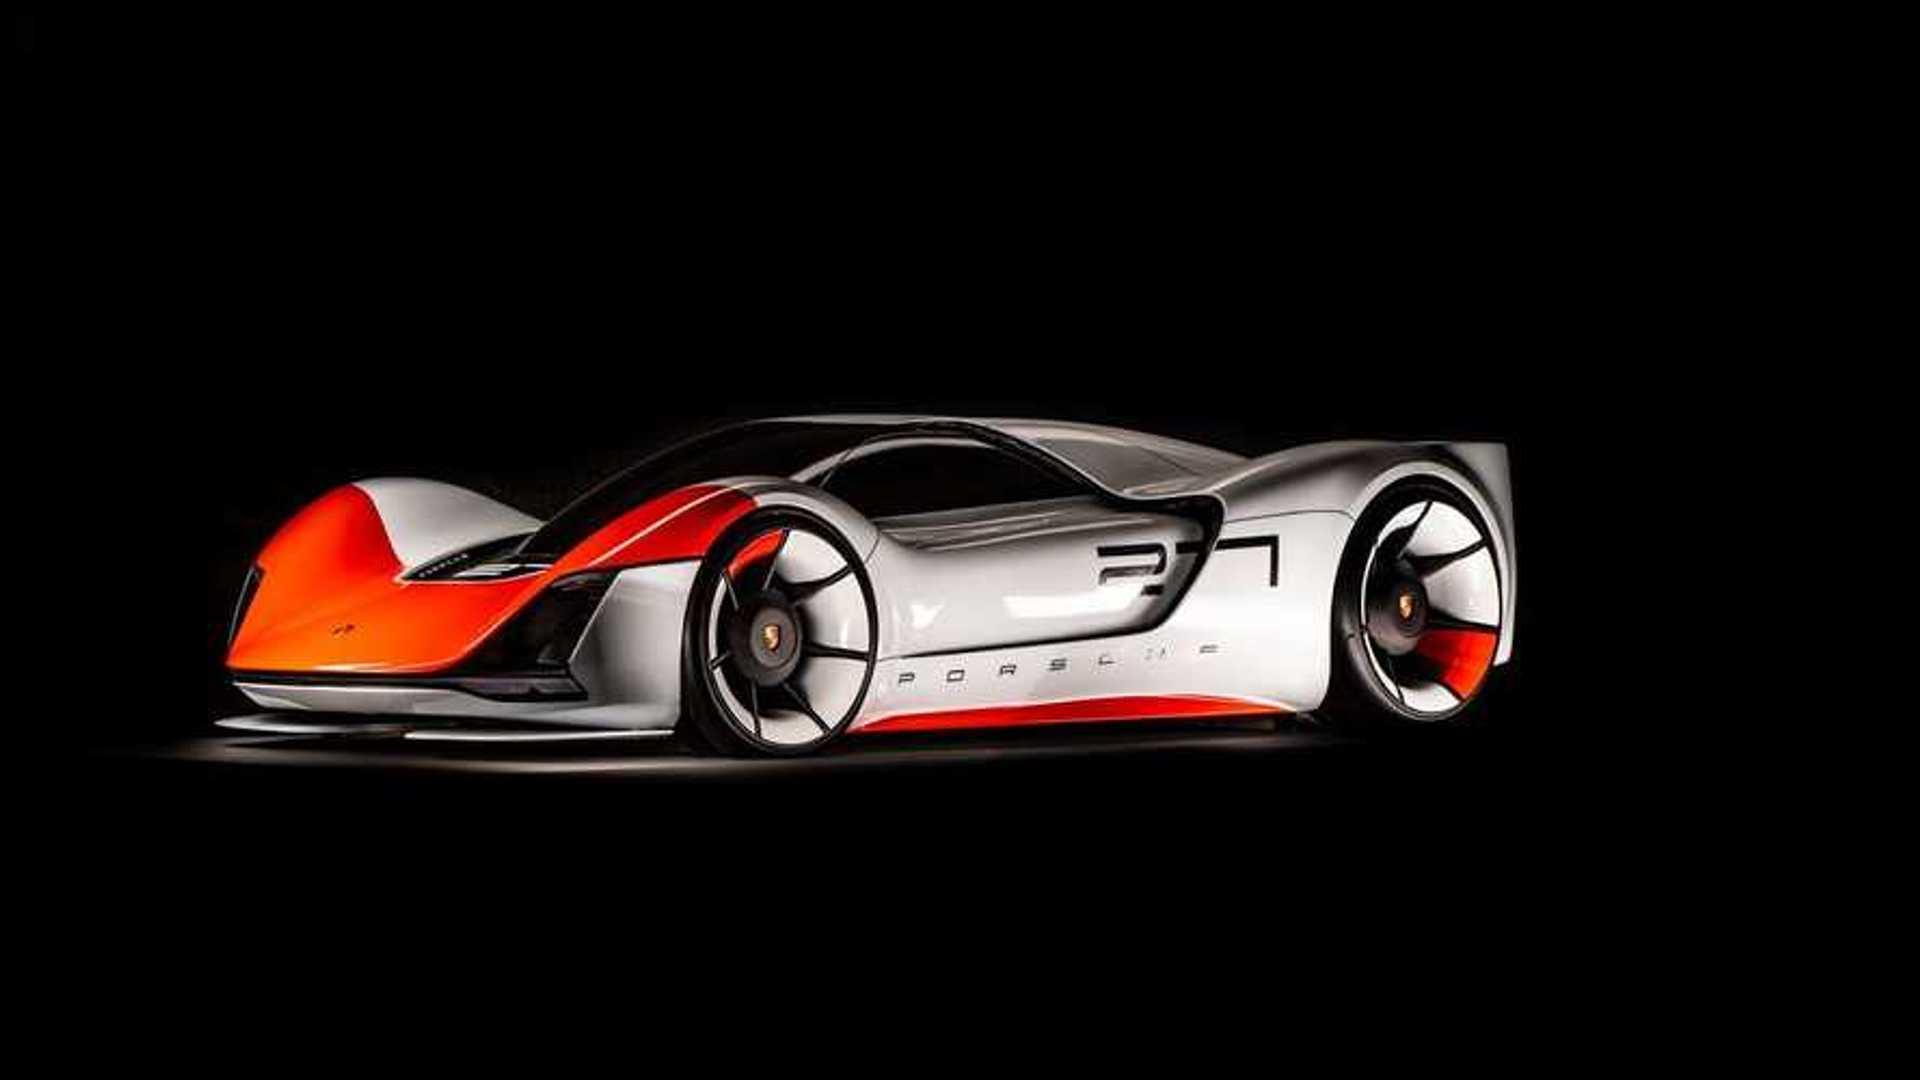 Porsche Vision 916 And 906 Living Legend Imagine Retro-Inspired Racers